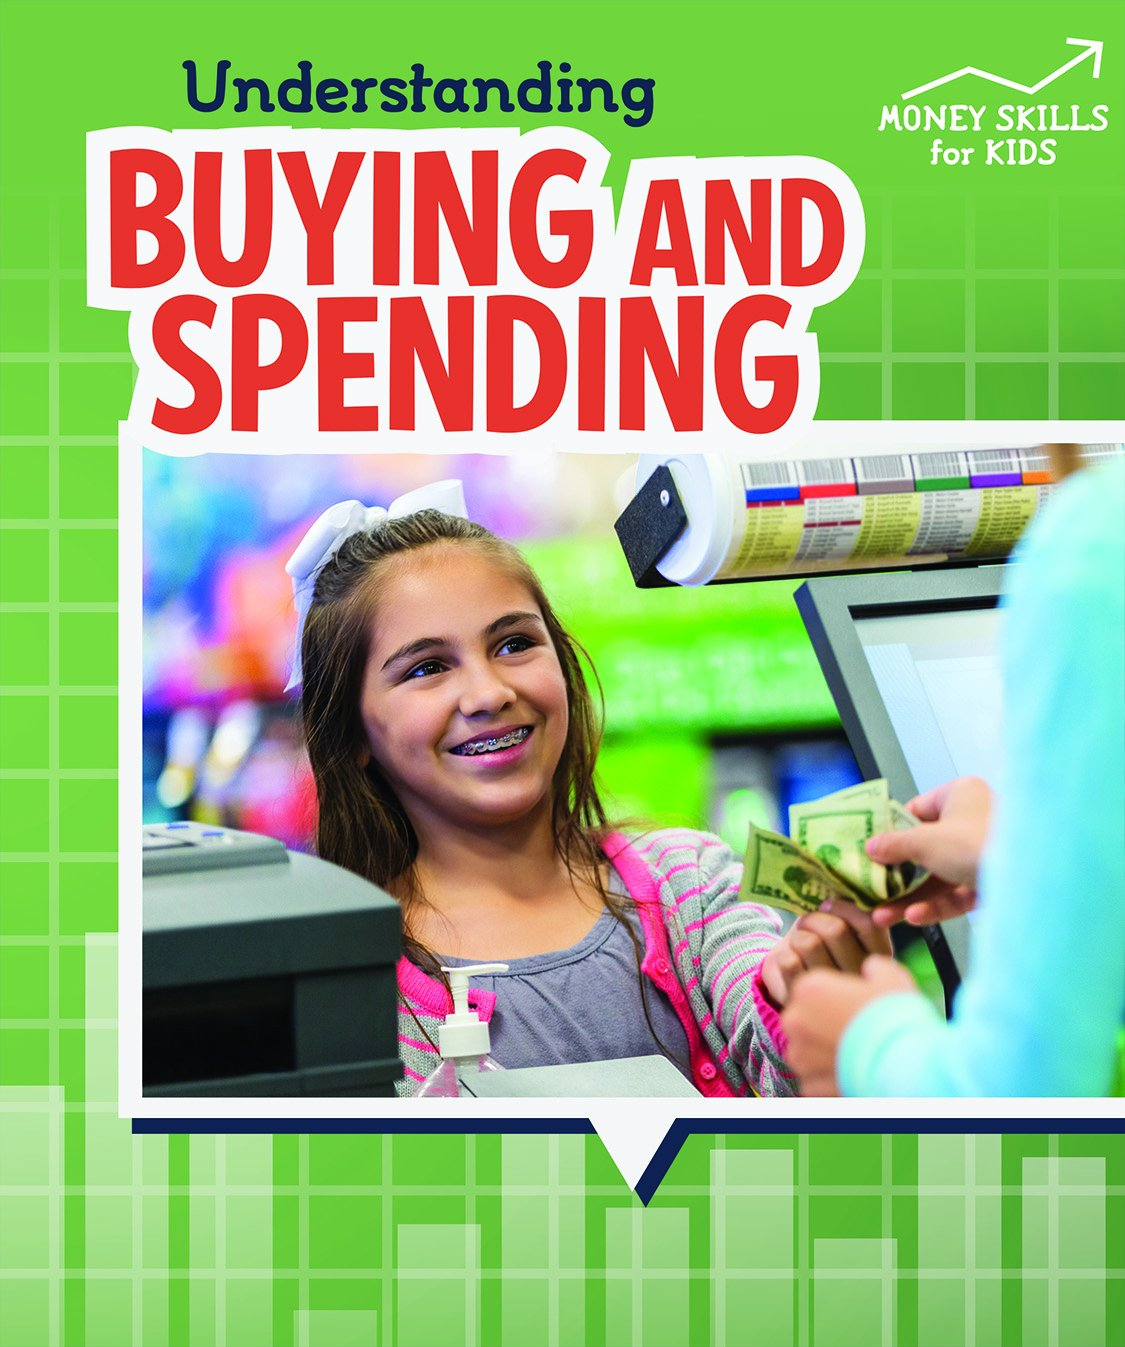 Understanding Buying and Spending (Money Skills for Kids)